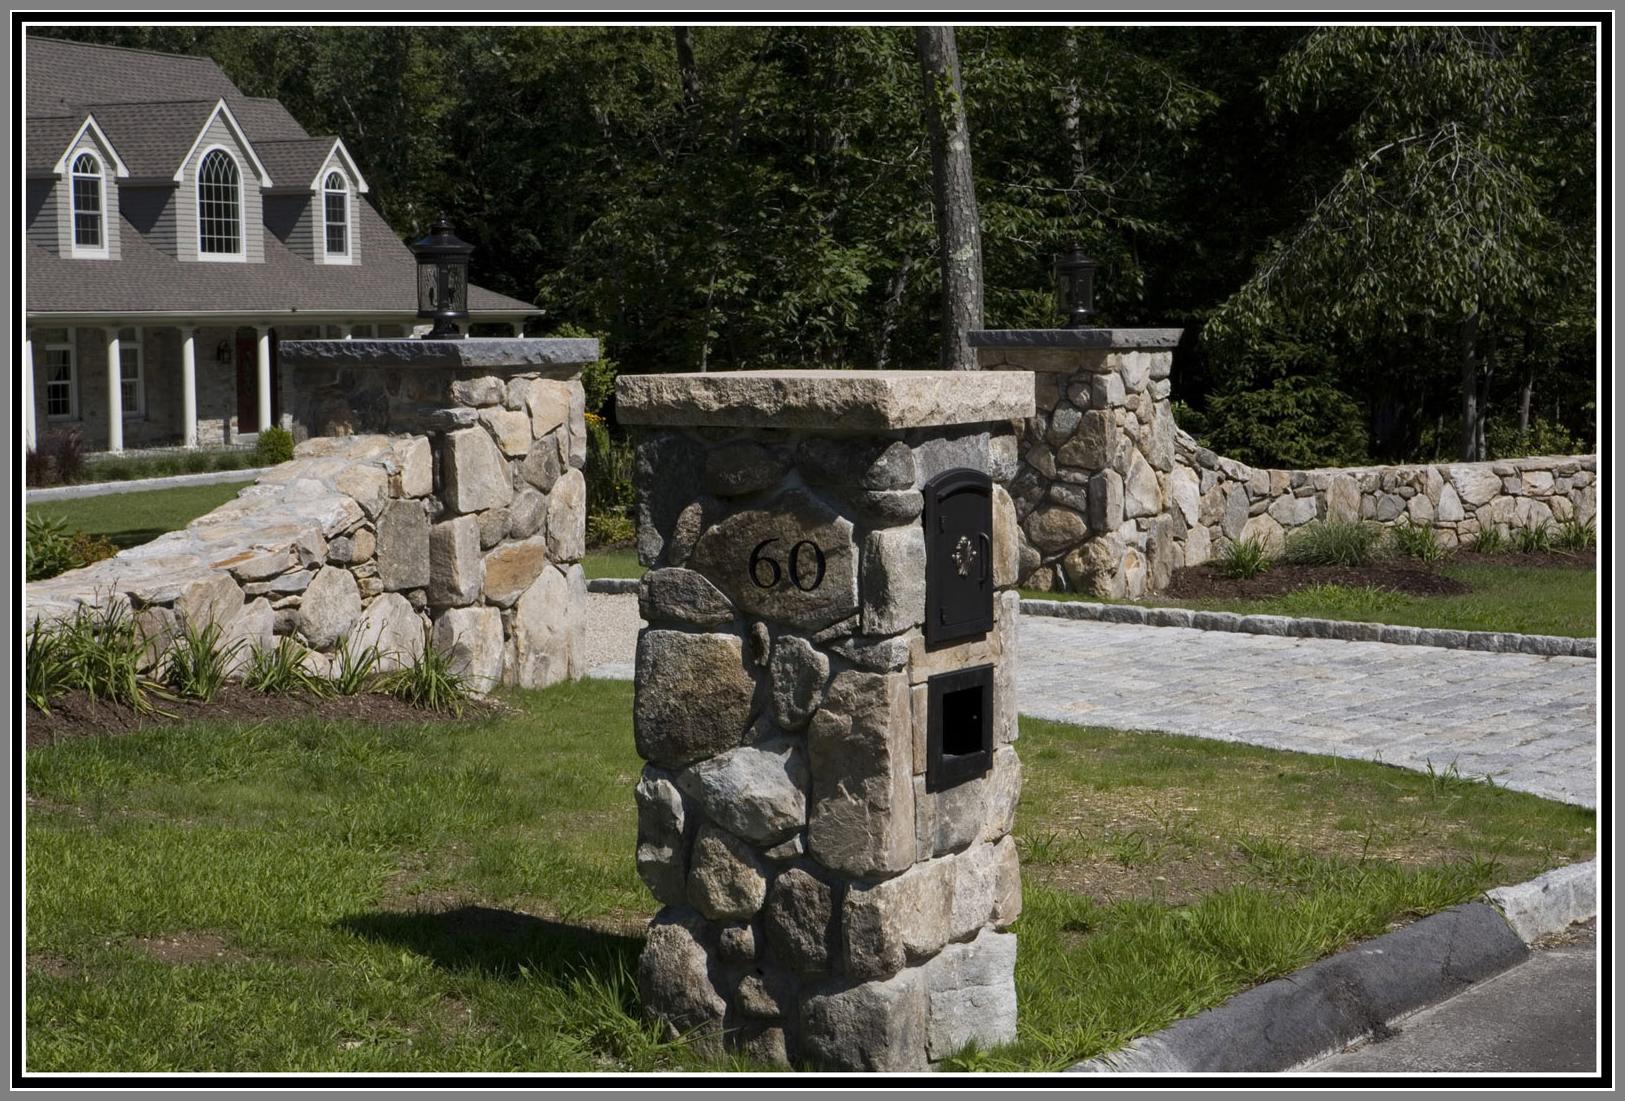 Stone mailbox, Column, cobblestone apron, curb and wall